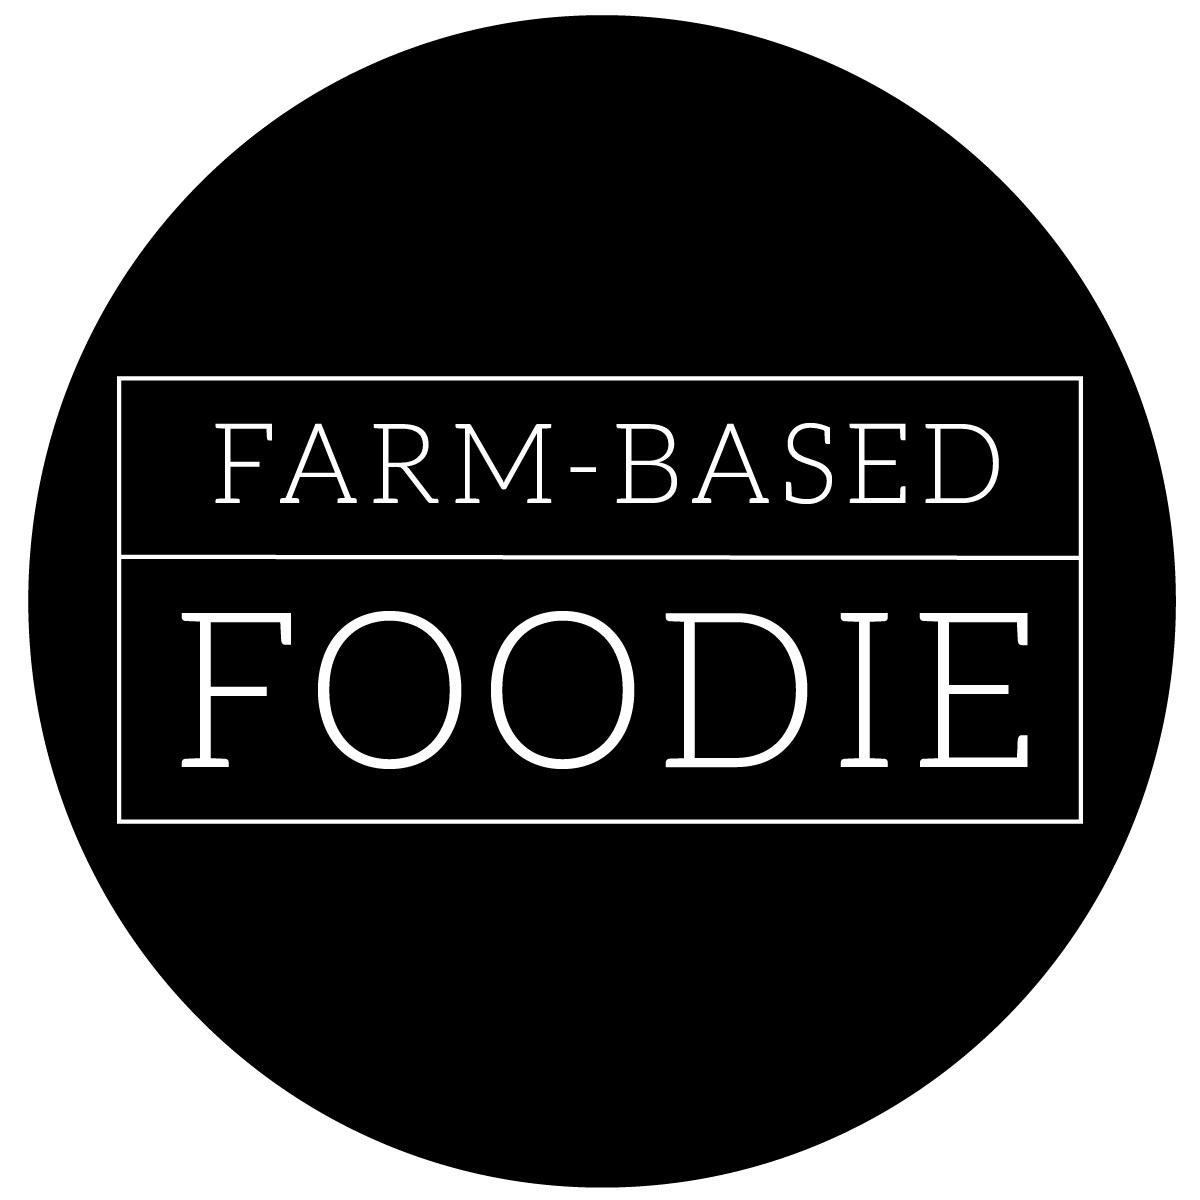 FBF High Quality Logo round.jpg